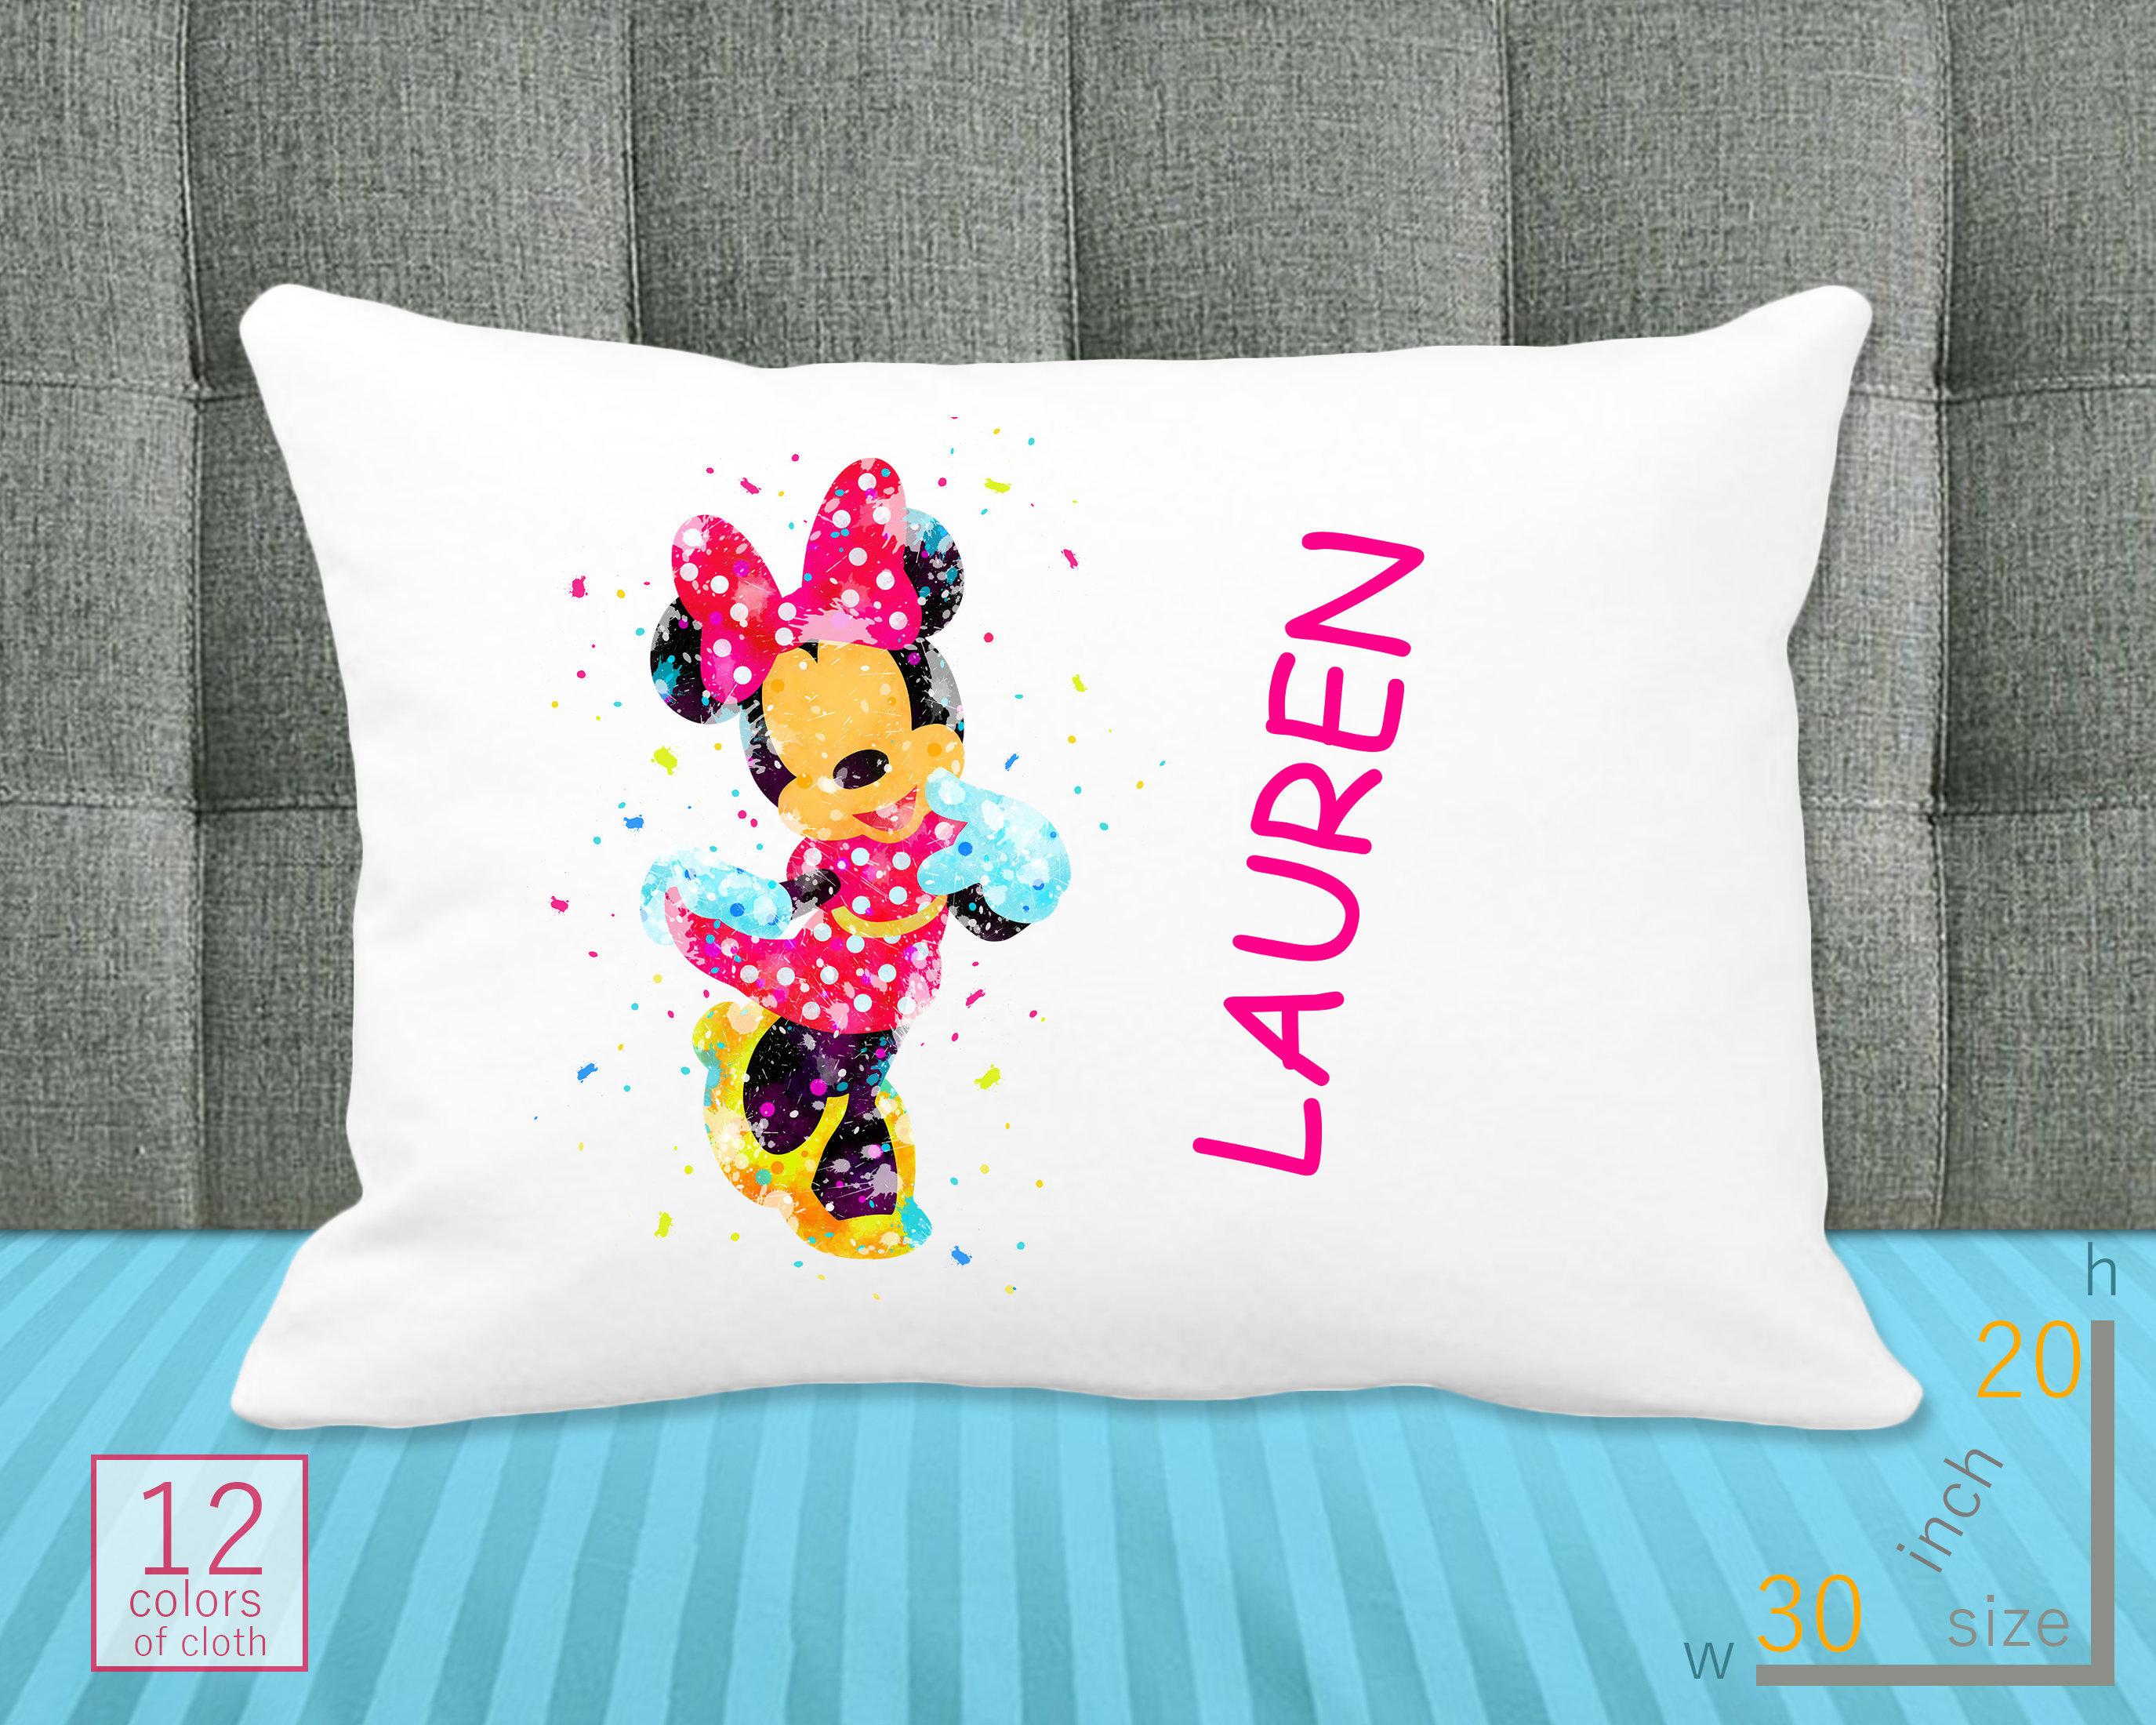 Disney Minnie /& Mickey mouse Love Wedding Linen Pillow Case cover Home Decor